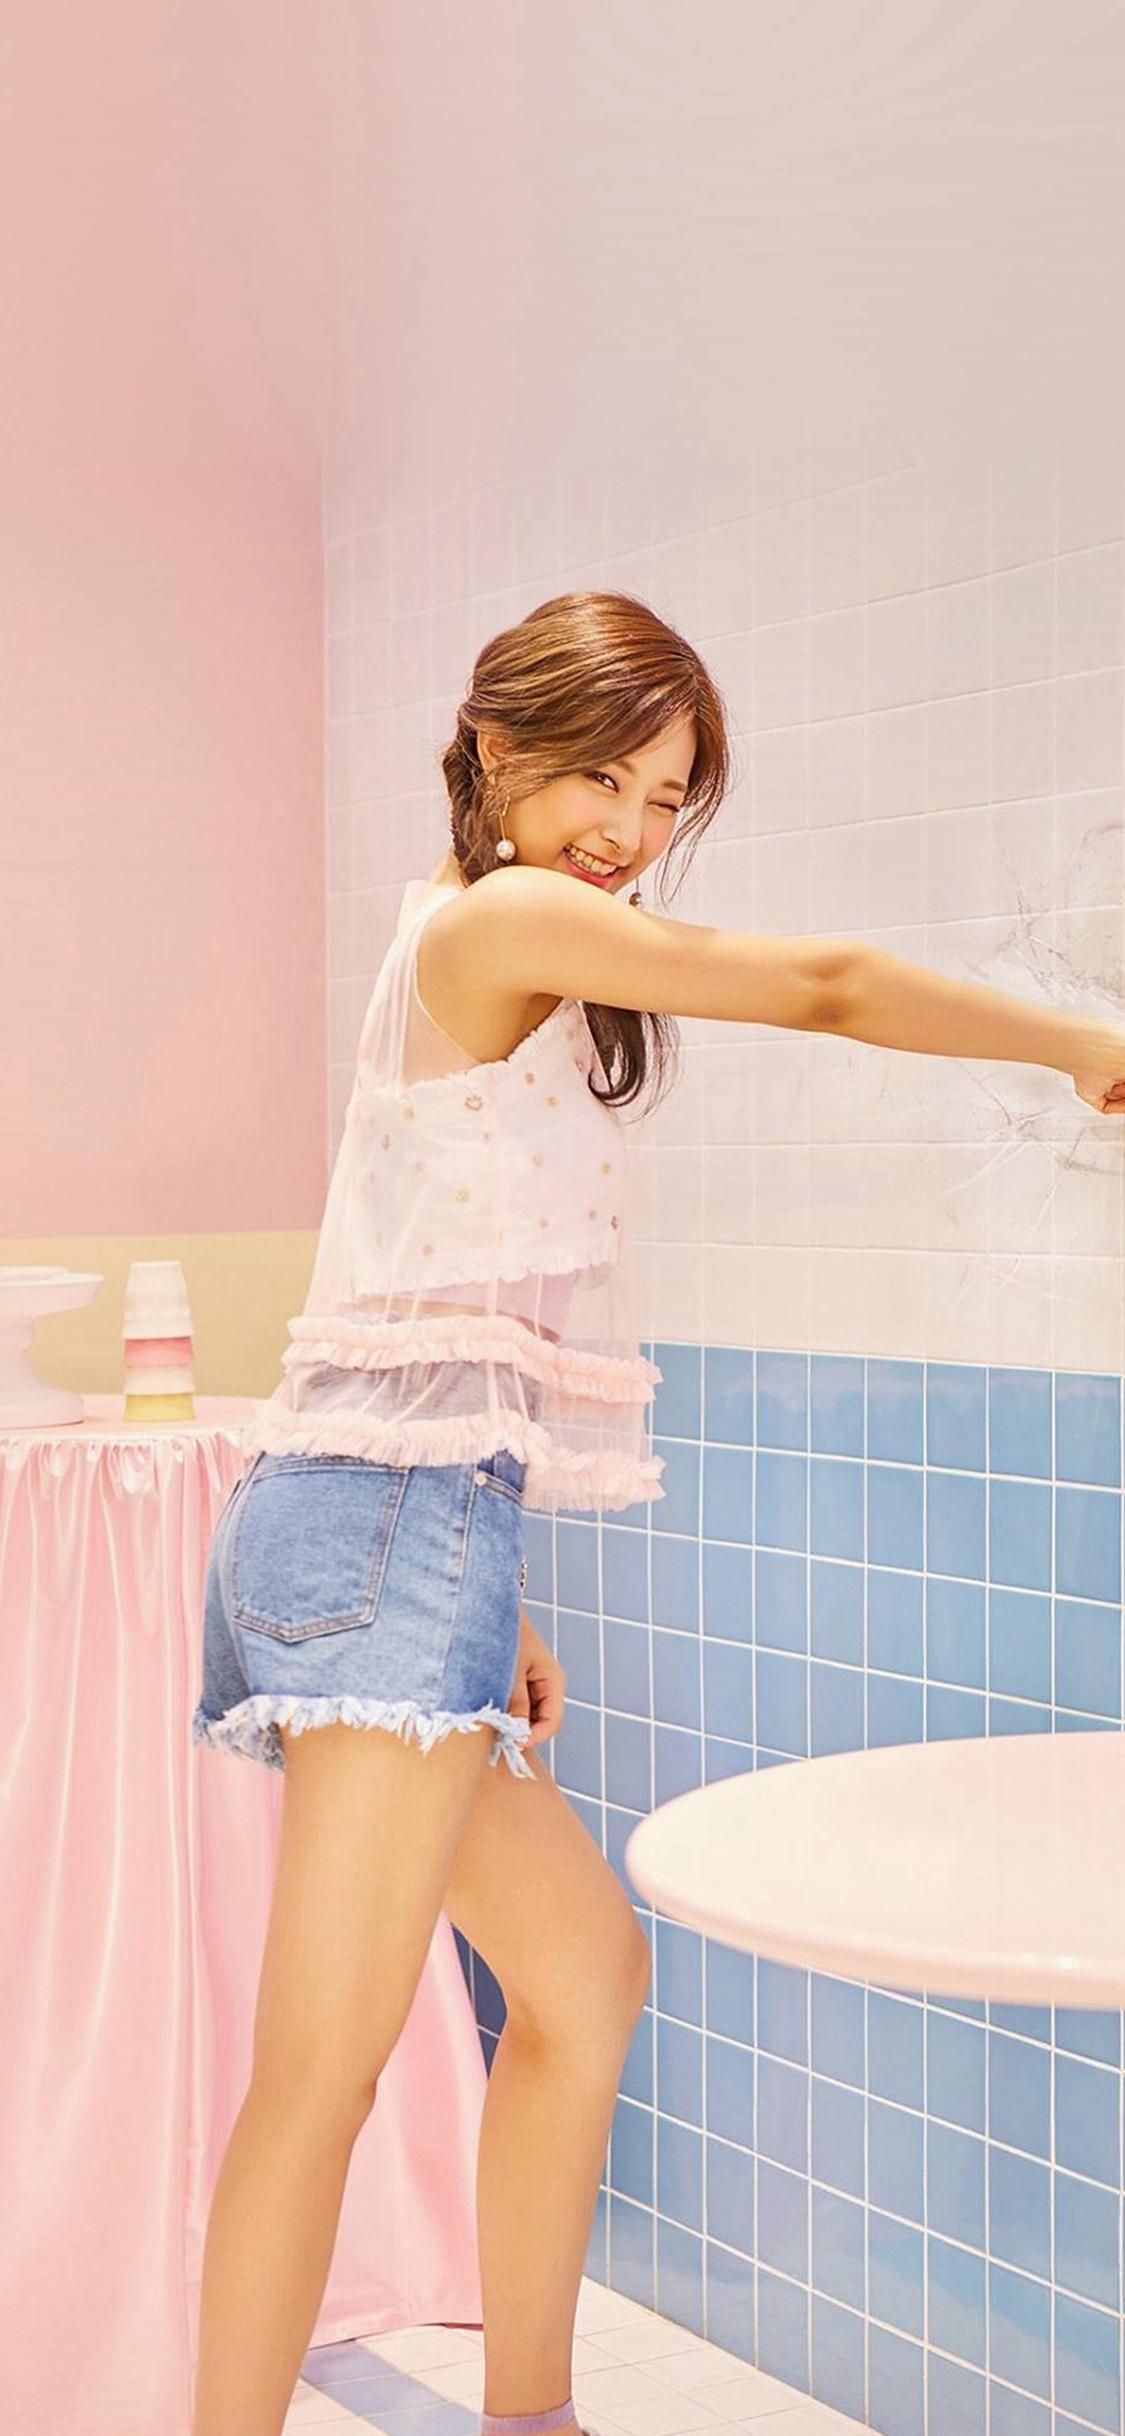 Tzuyu Kpop Twice Girl Cute Pink Iphone X Wallpapers Free